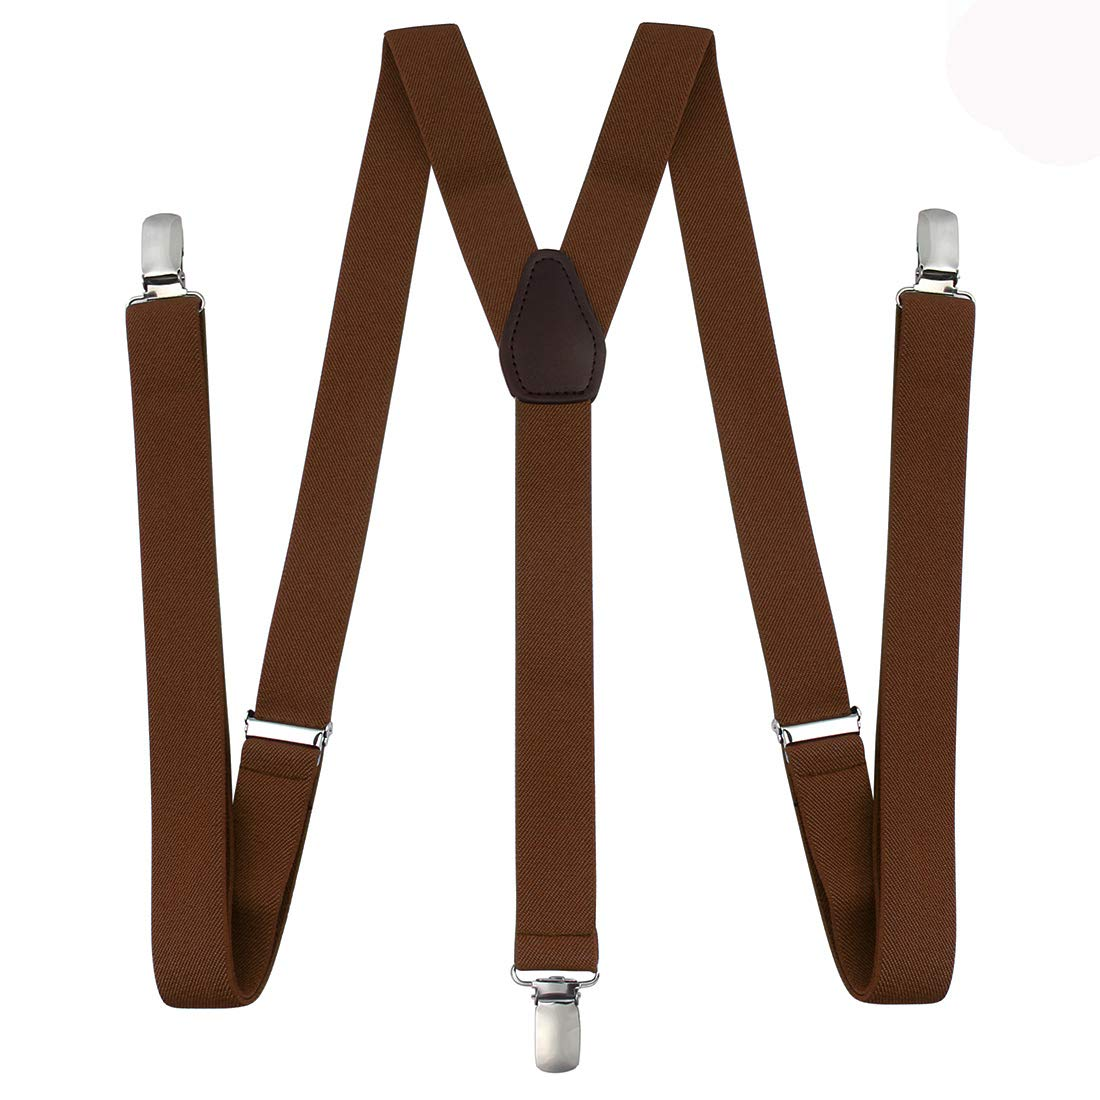 Suspenders for Men - Adjustable Elastic Y Back Style Suspender - Strong Clips (Unisex) RSG-1105-B1